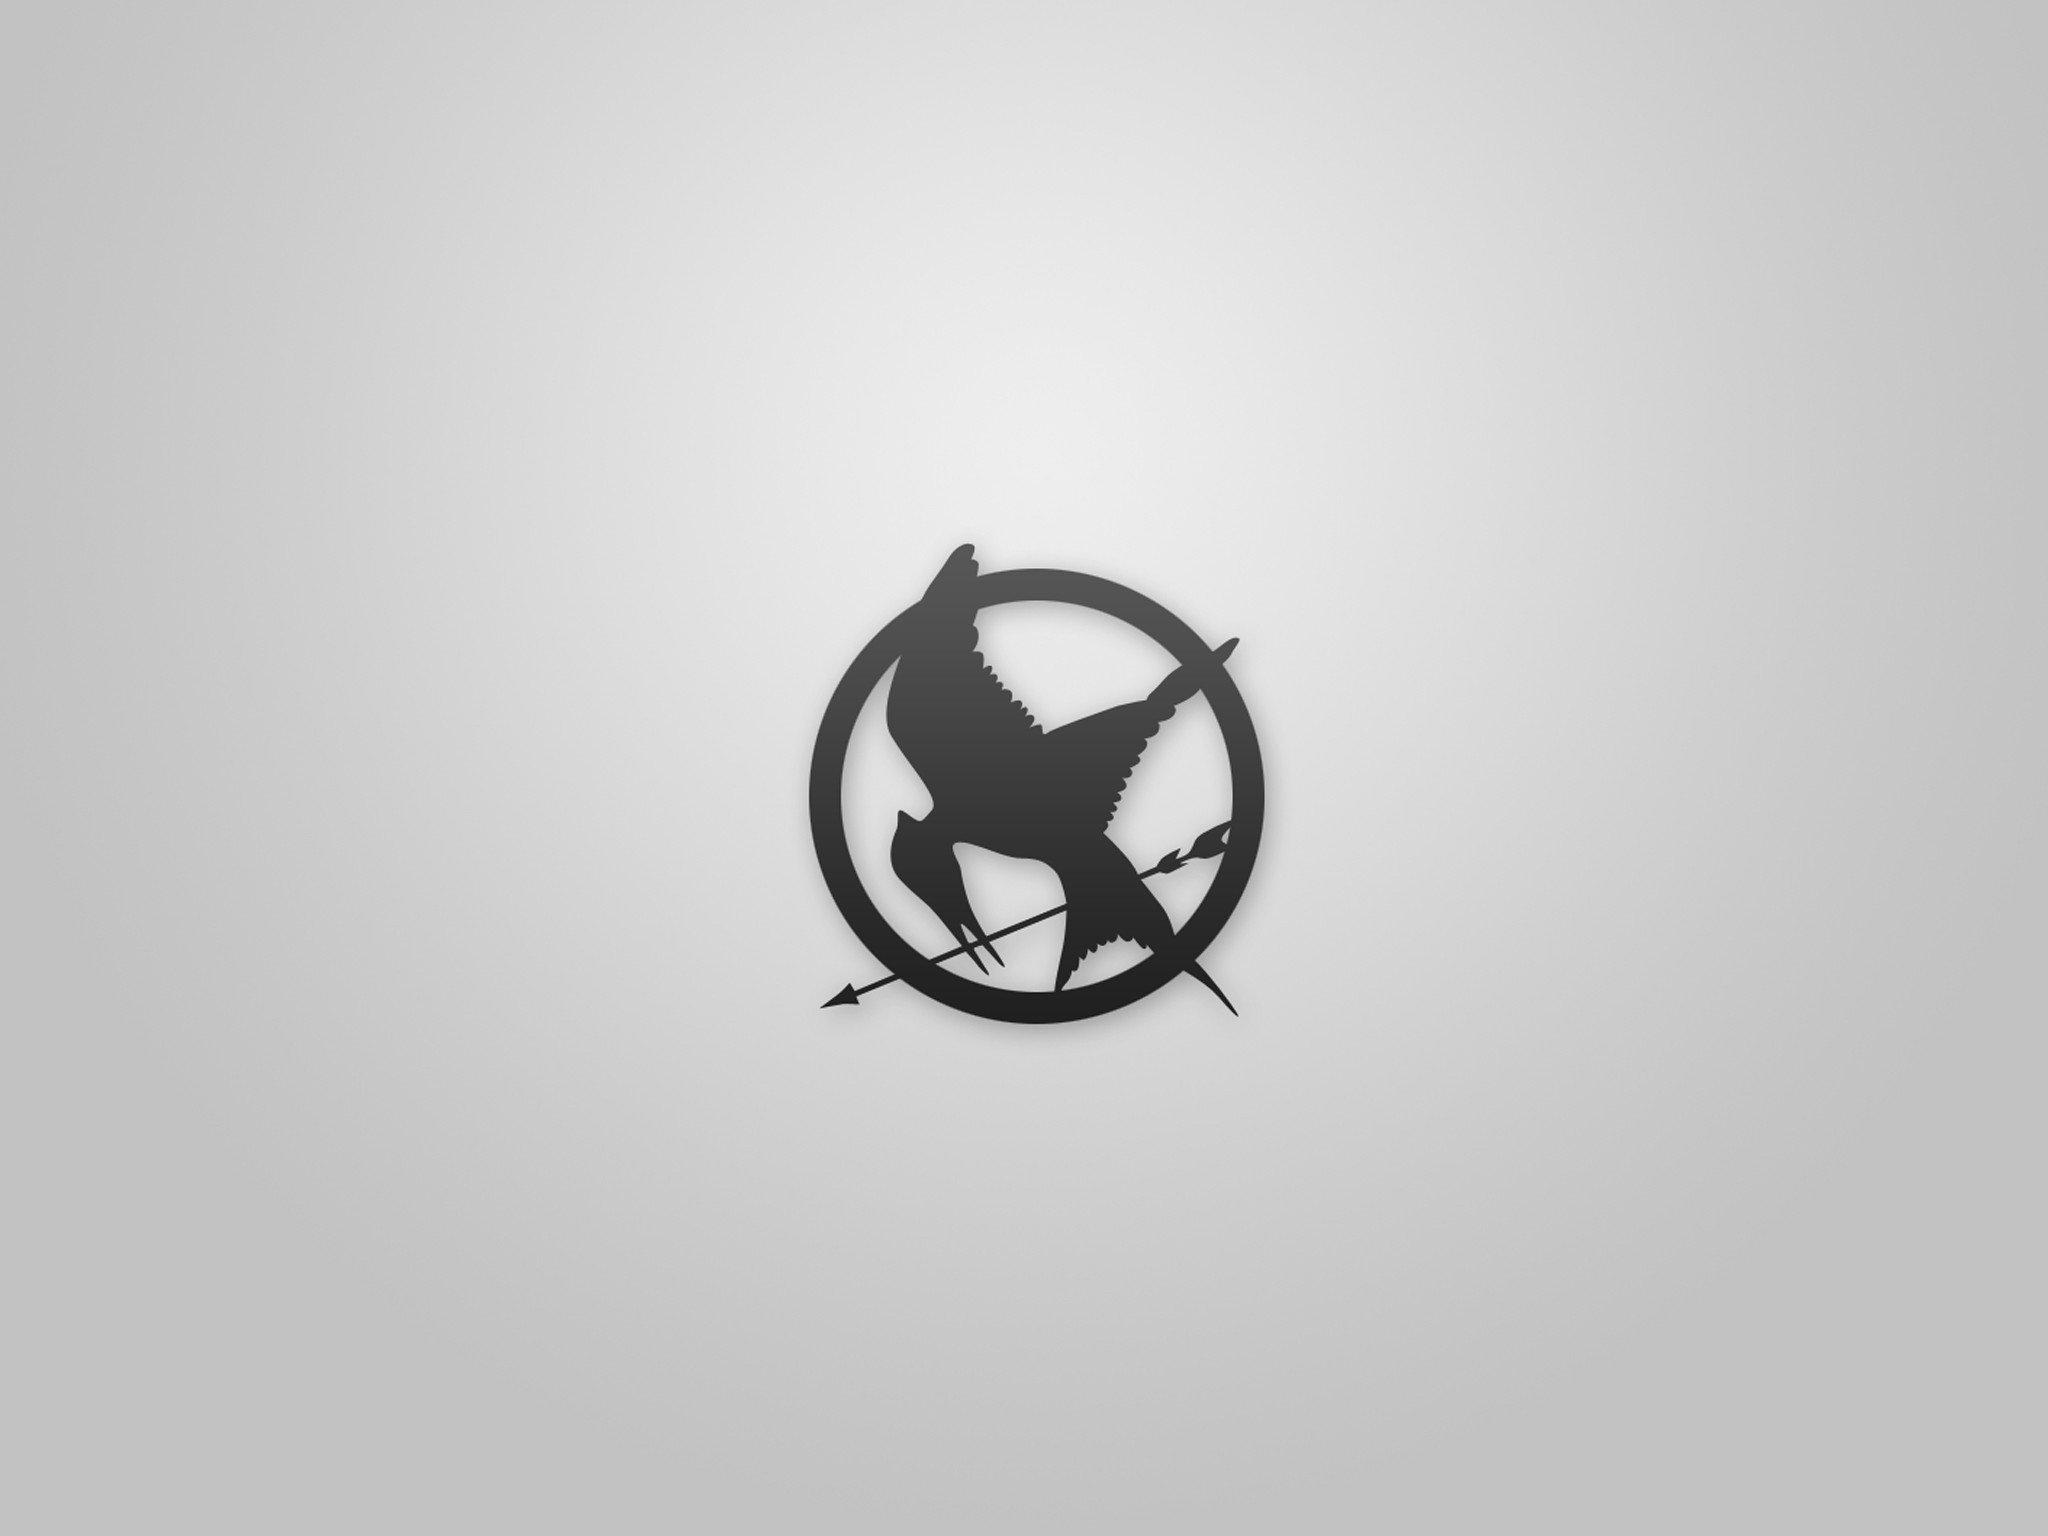 50 Hunger Games Wallpaper For Ipad On Wallpapersafari